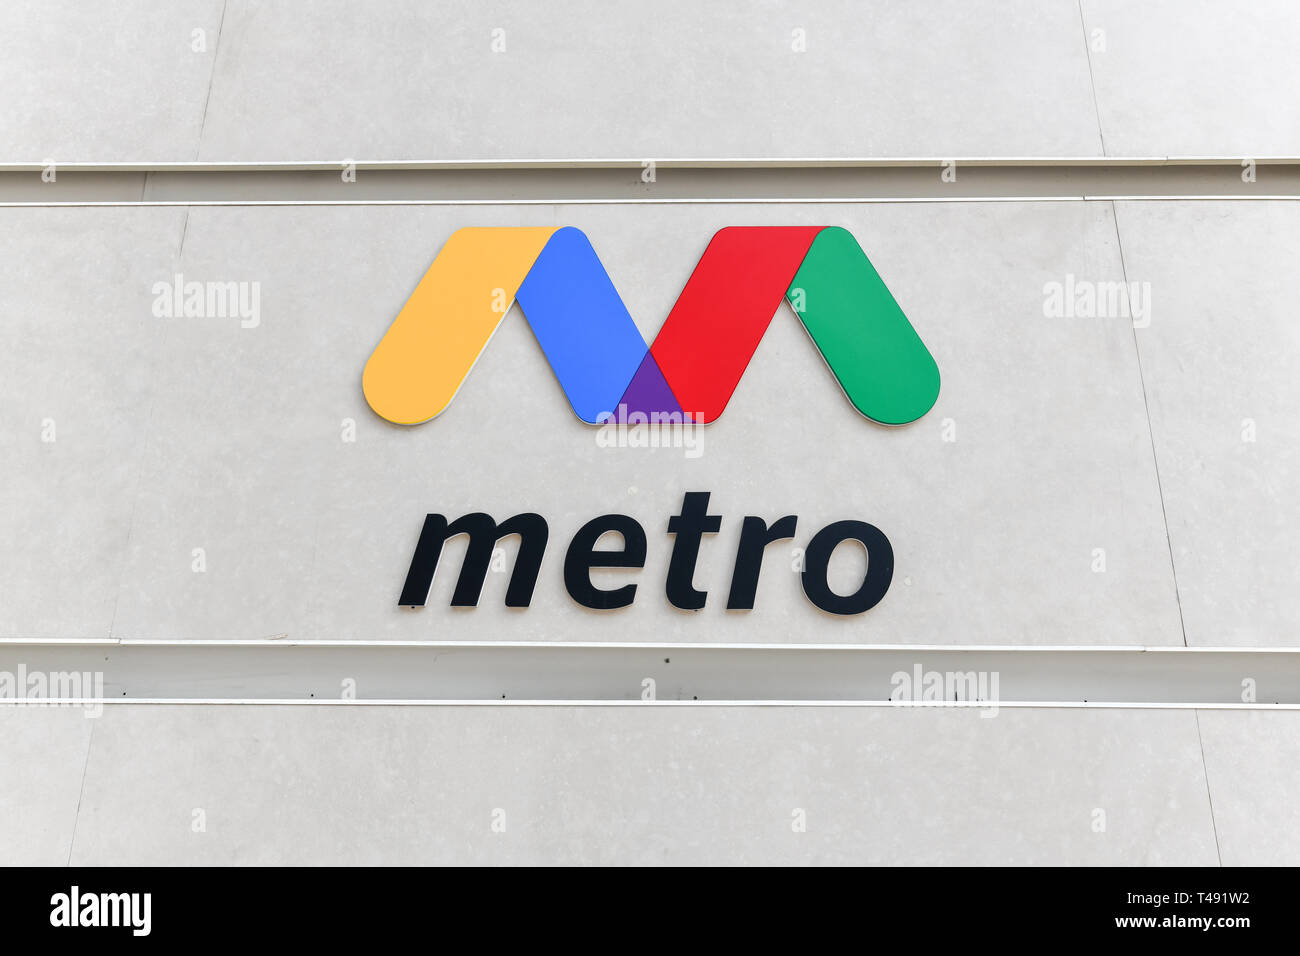 Baku, Azerbaijan - July 15, 2018: Logo for the Metro in the city of Baku, Azerbaijan. - Stock Image